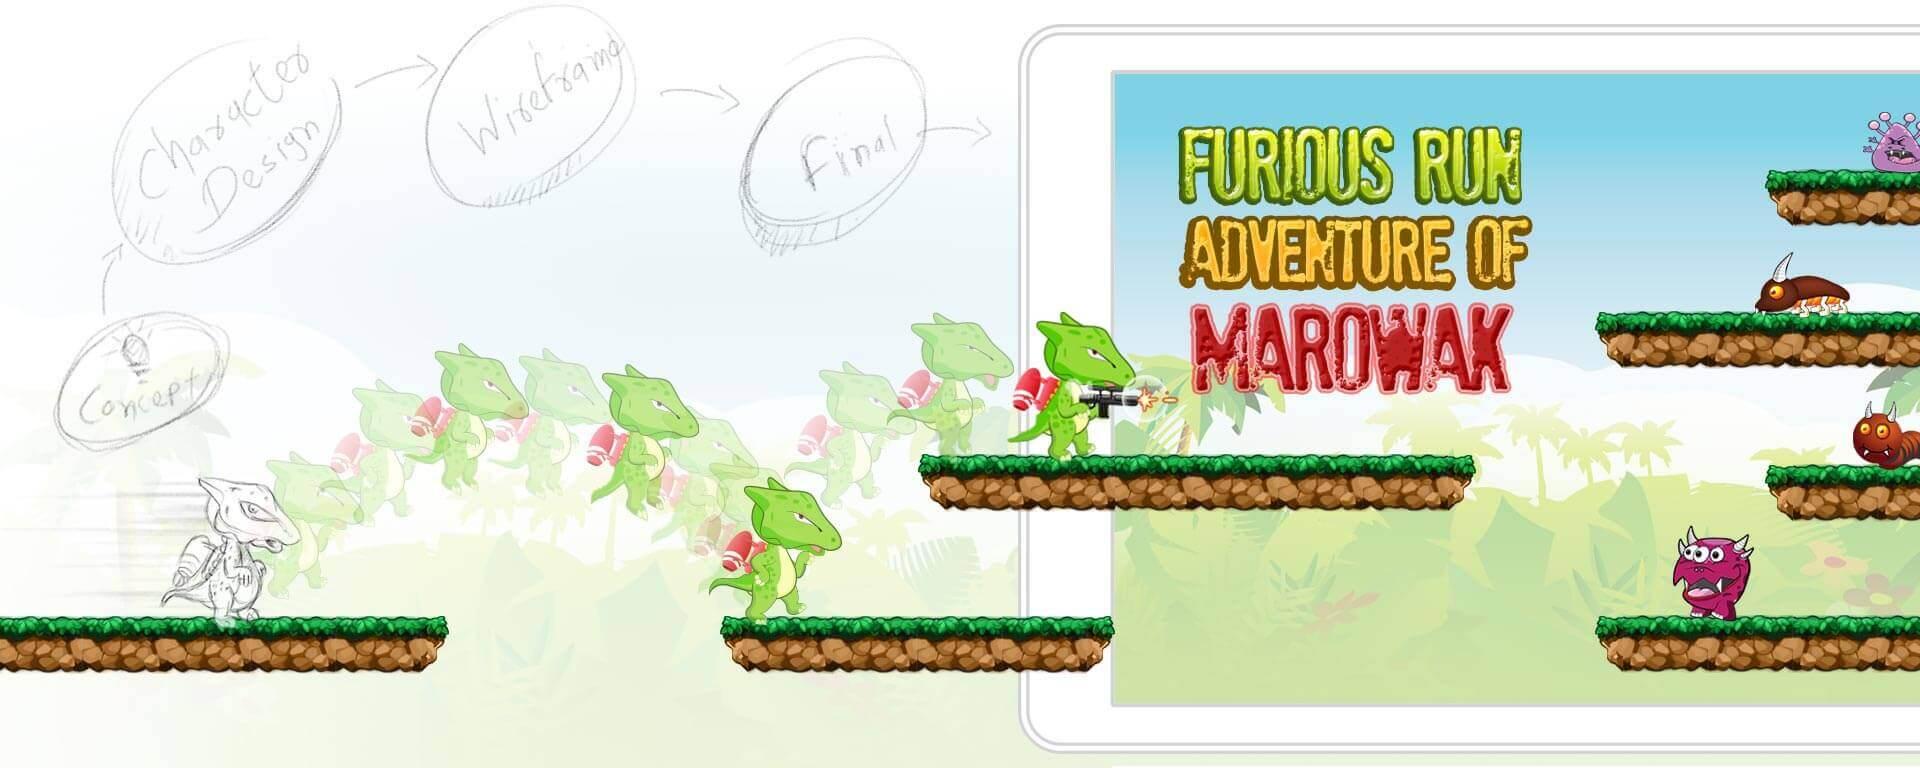 marowak-game-design